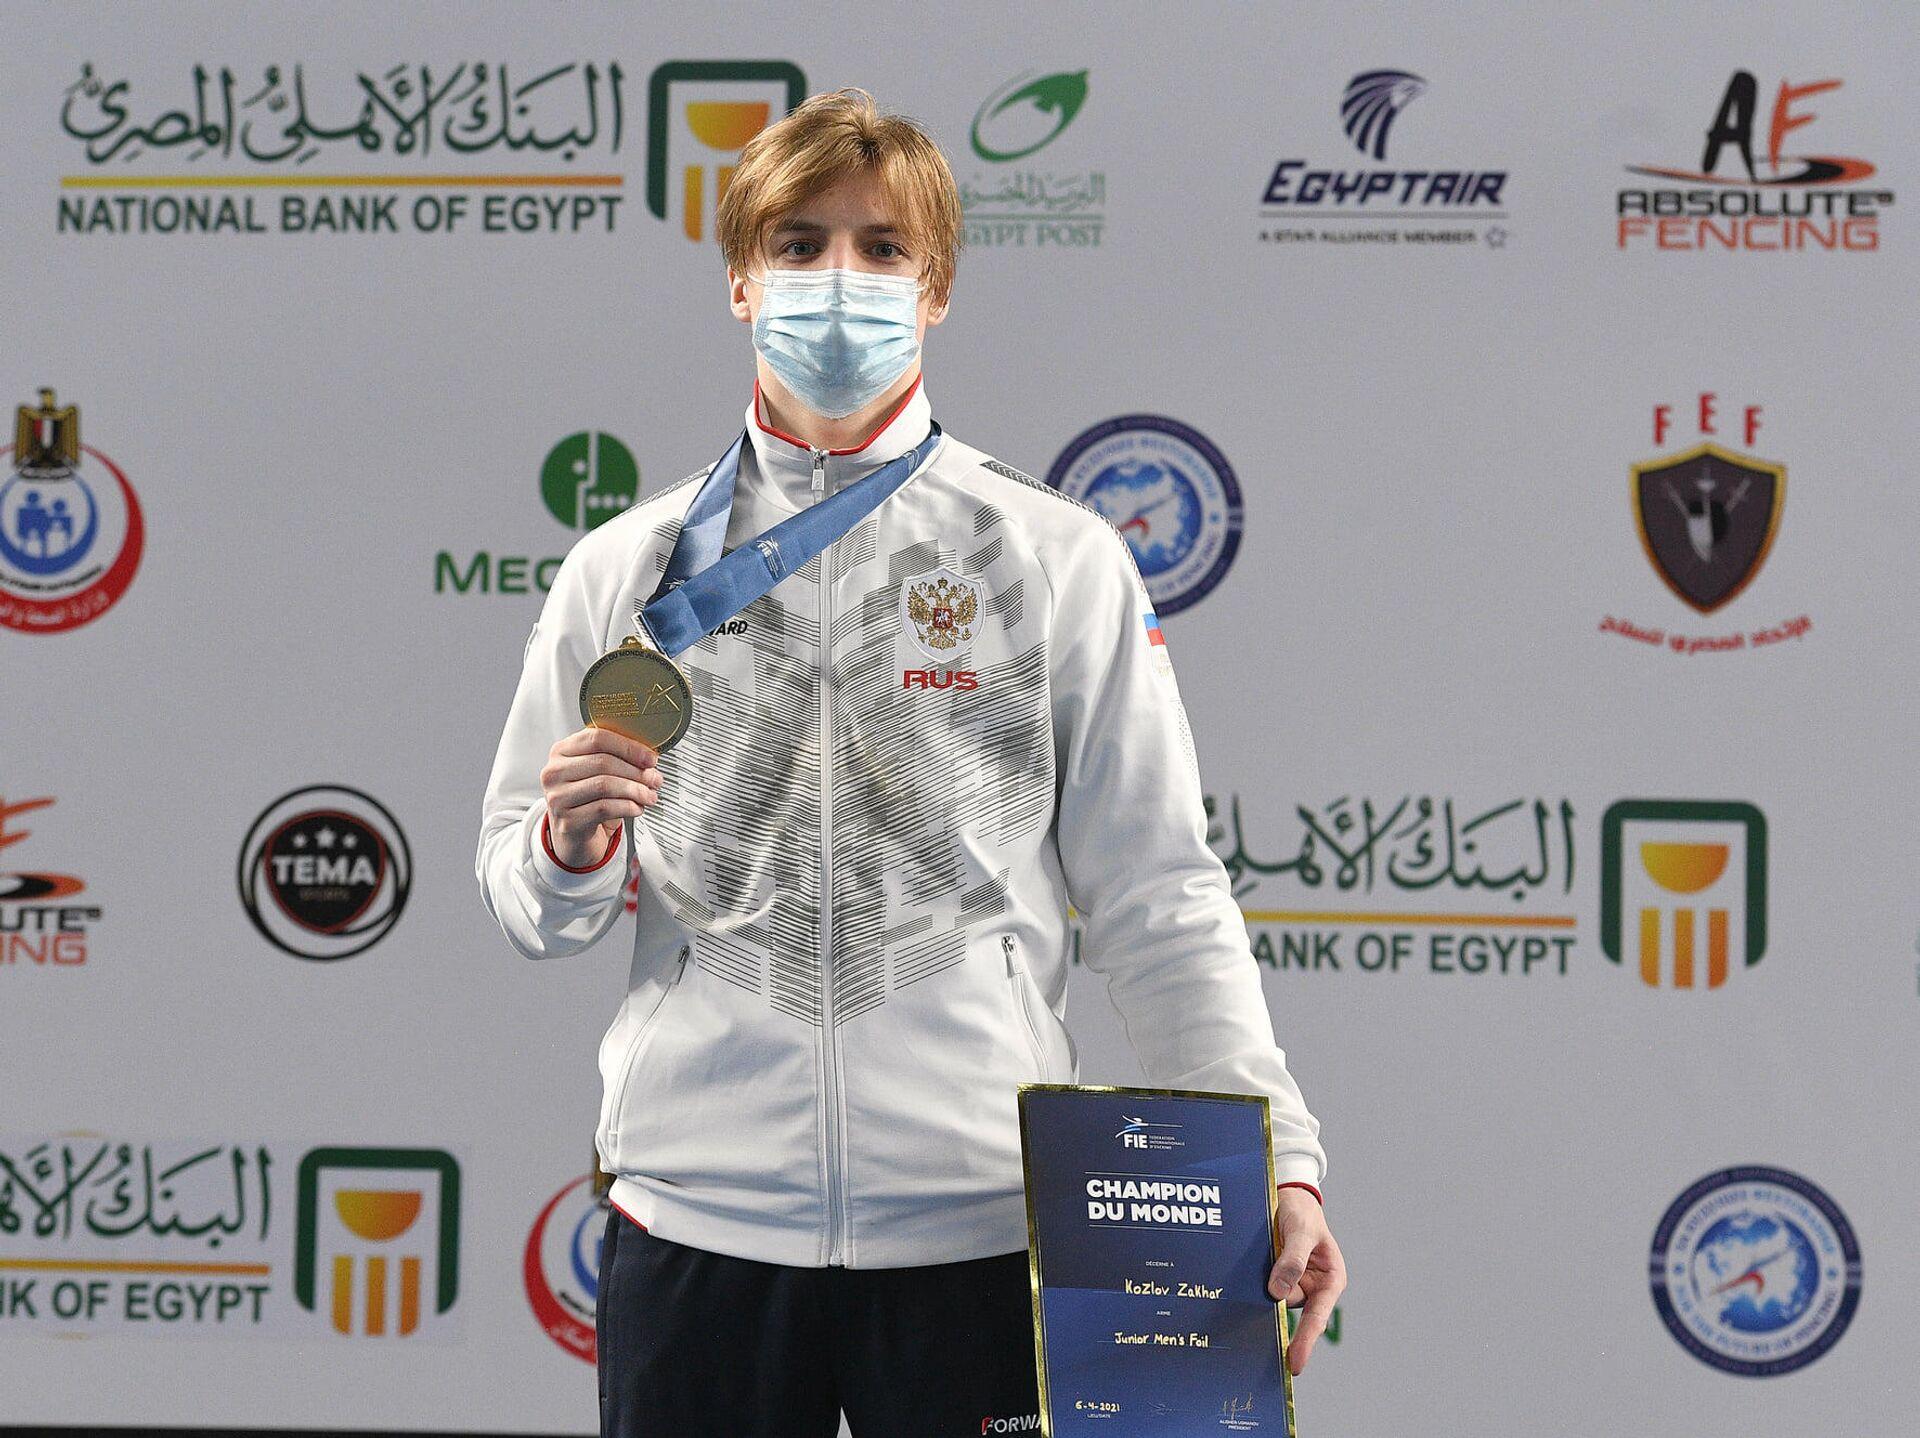 Захар Козлов – чемпион мира среди юниоров 2021 года по фехтованию на рапирах - РИА Новости, 1920, 12.04.2021